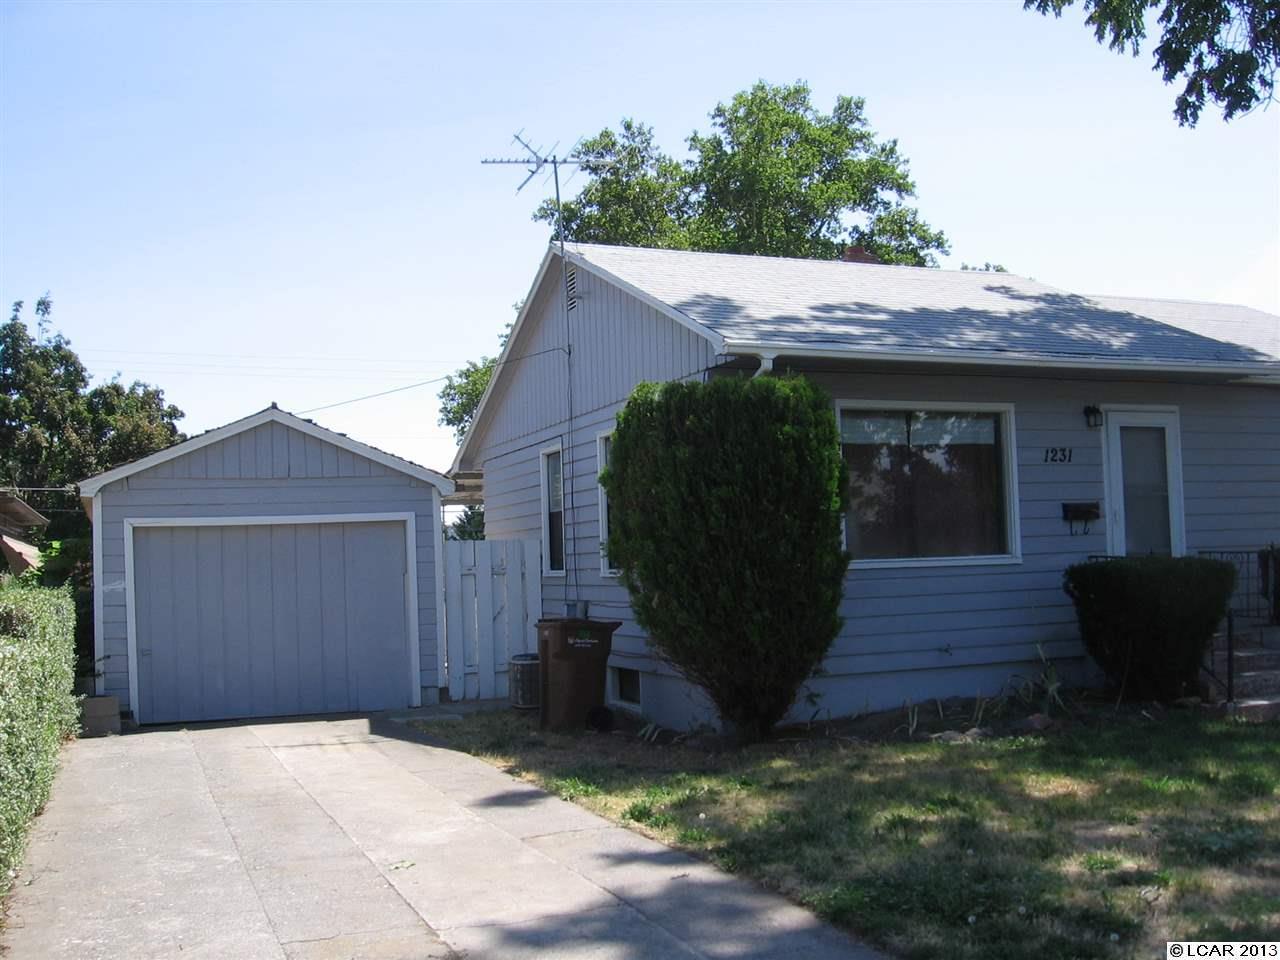 1231 4th St, Clarkston, WA 99403